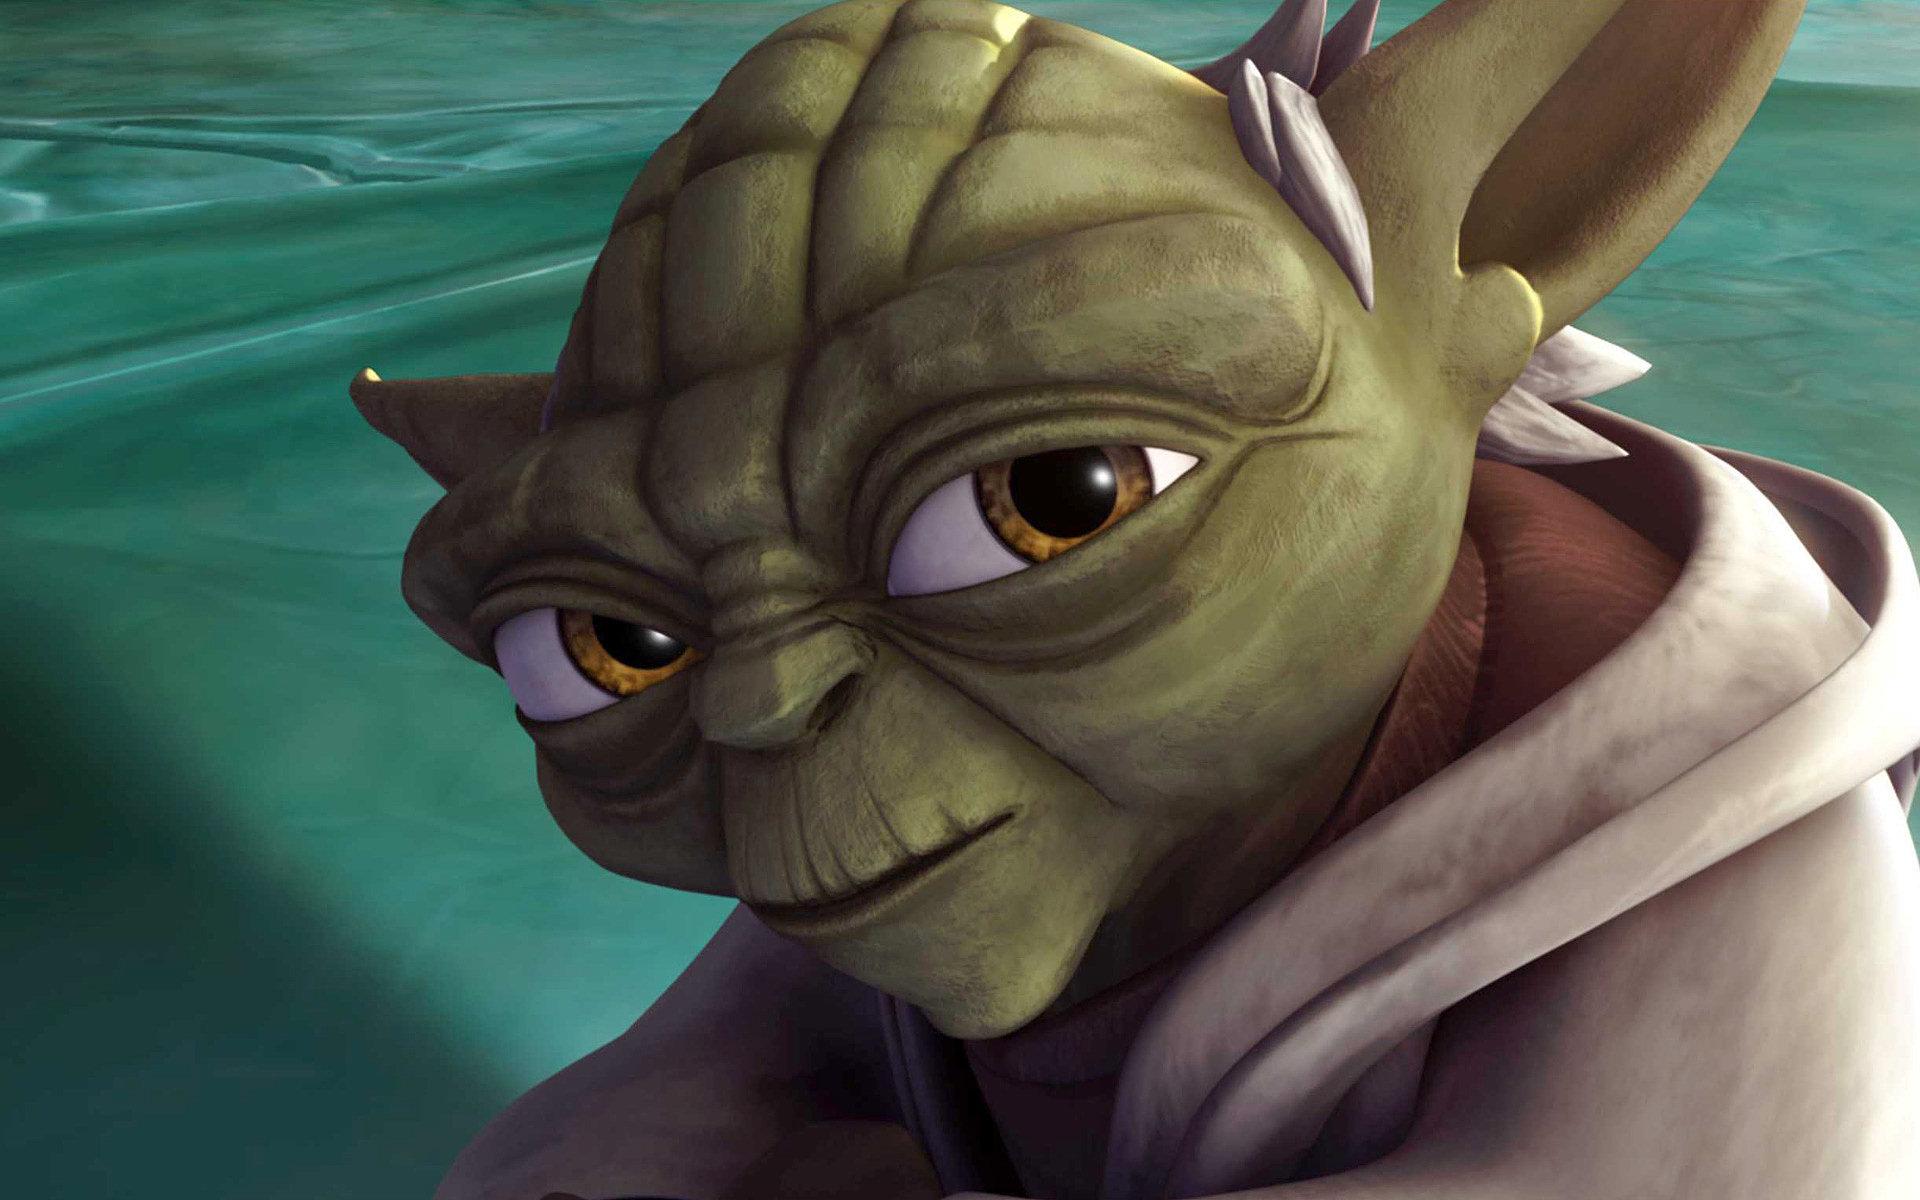 Star Wars Rebels Wallpapers Hd For Desktop Backgrounds